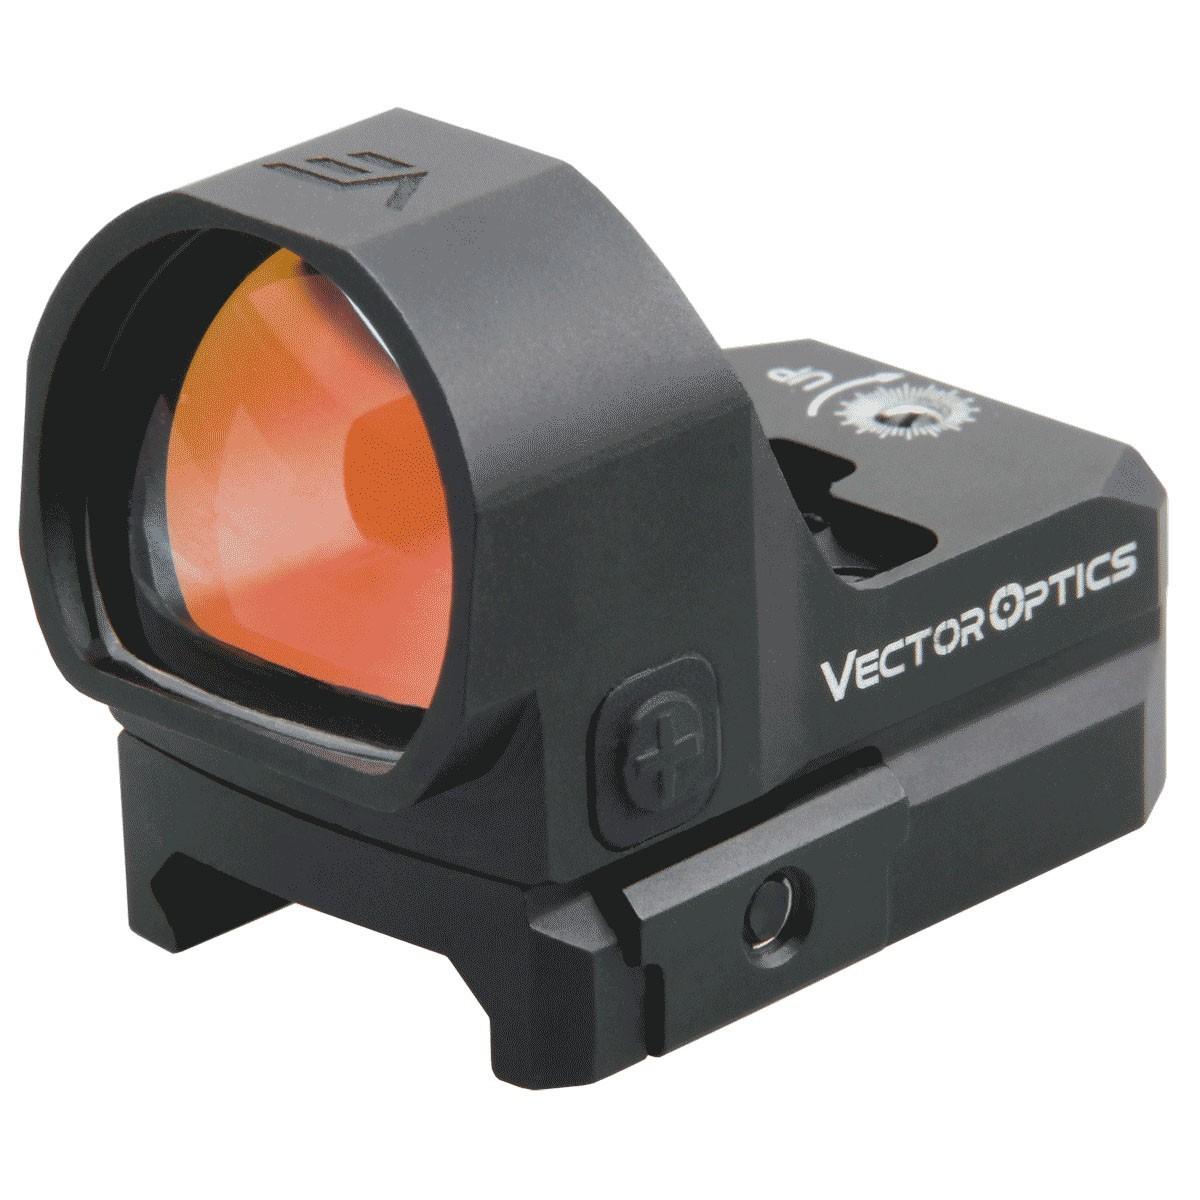 Red Dot Vector Optics Frenzy 1x22x26mm